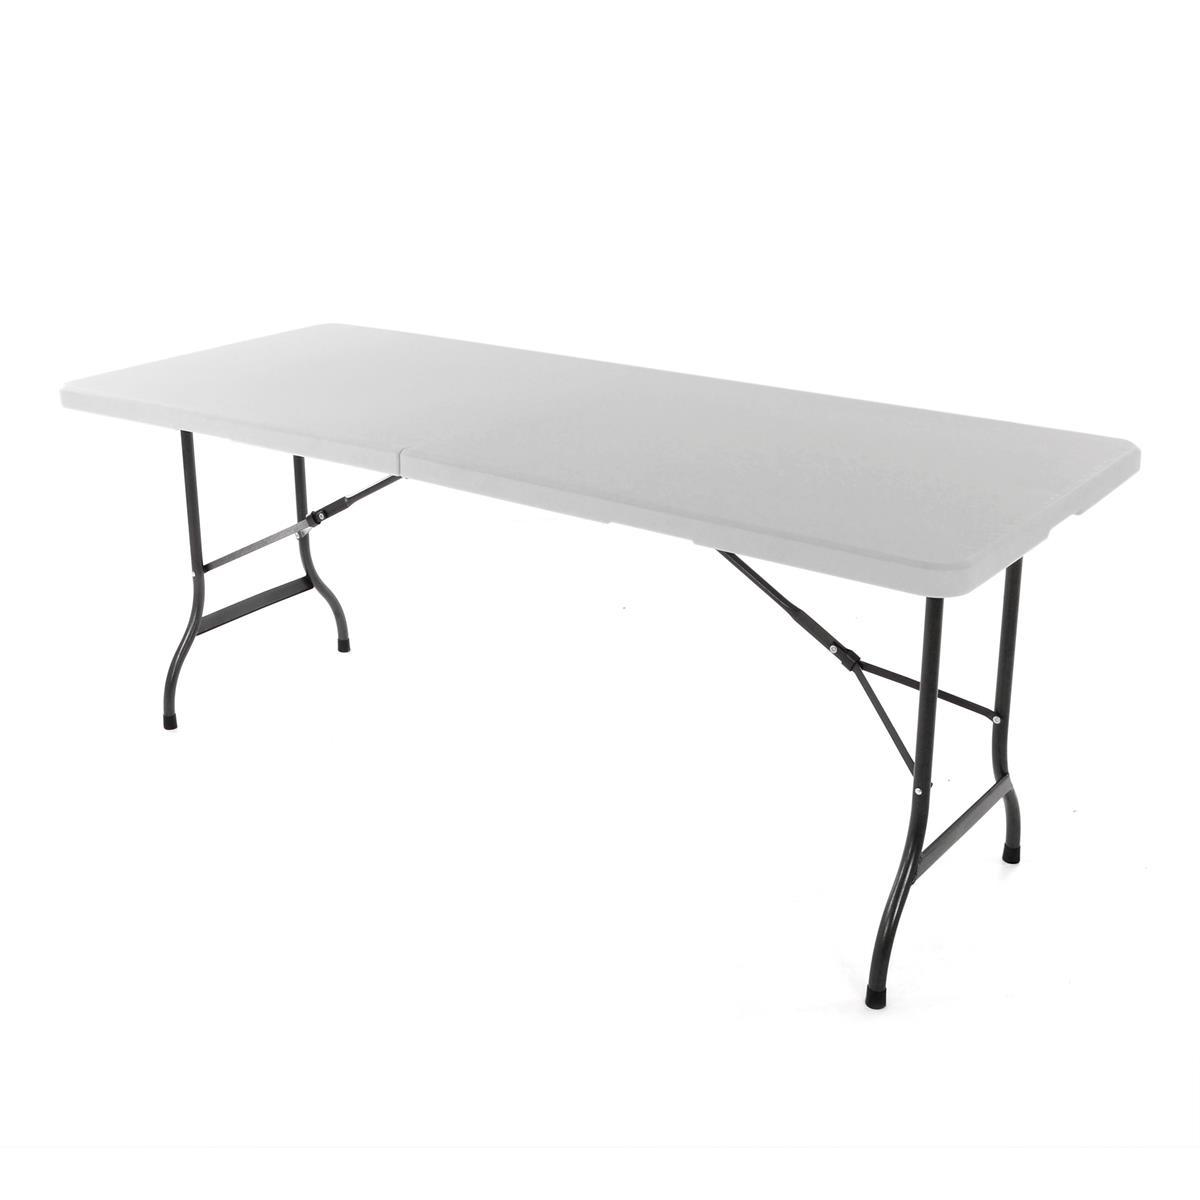 Klapptisch Campingtisch 180 cm Partytisch Catering Gartentisch